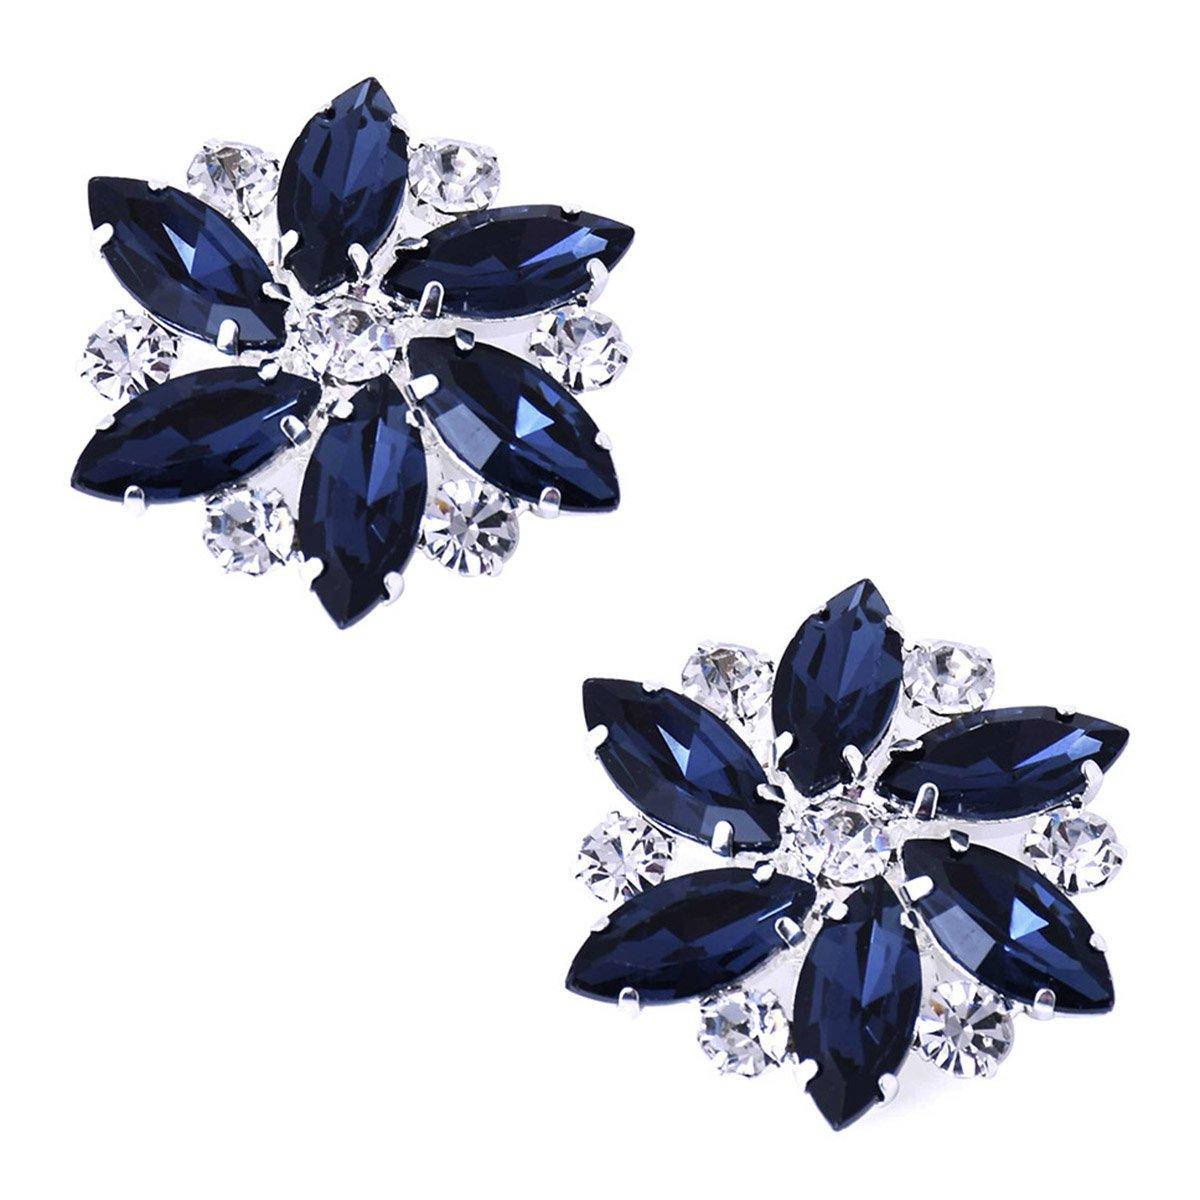 ElegantPark AJ Shoes Dress Hat Accessories Fashion Rhinestones Crystal Shoe Clips 2 Pcs Navy Blue